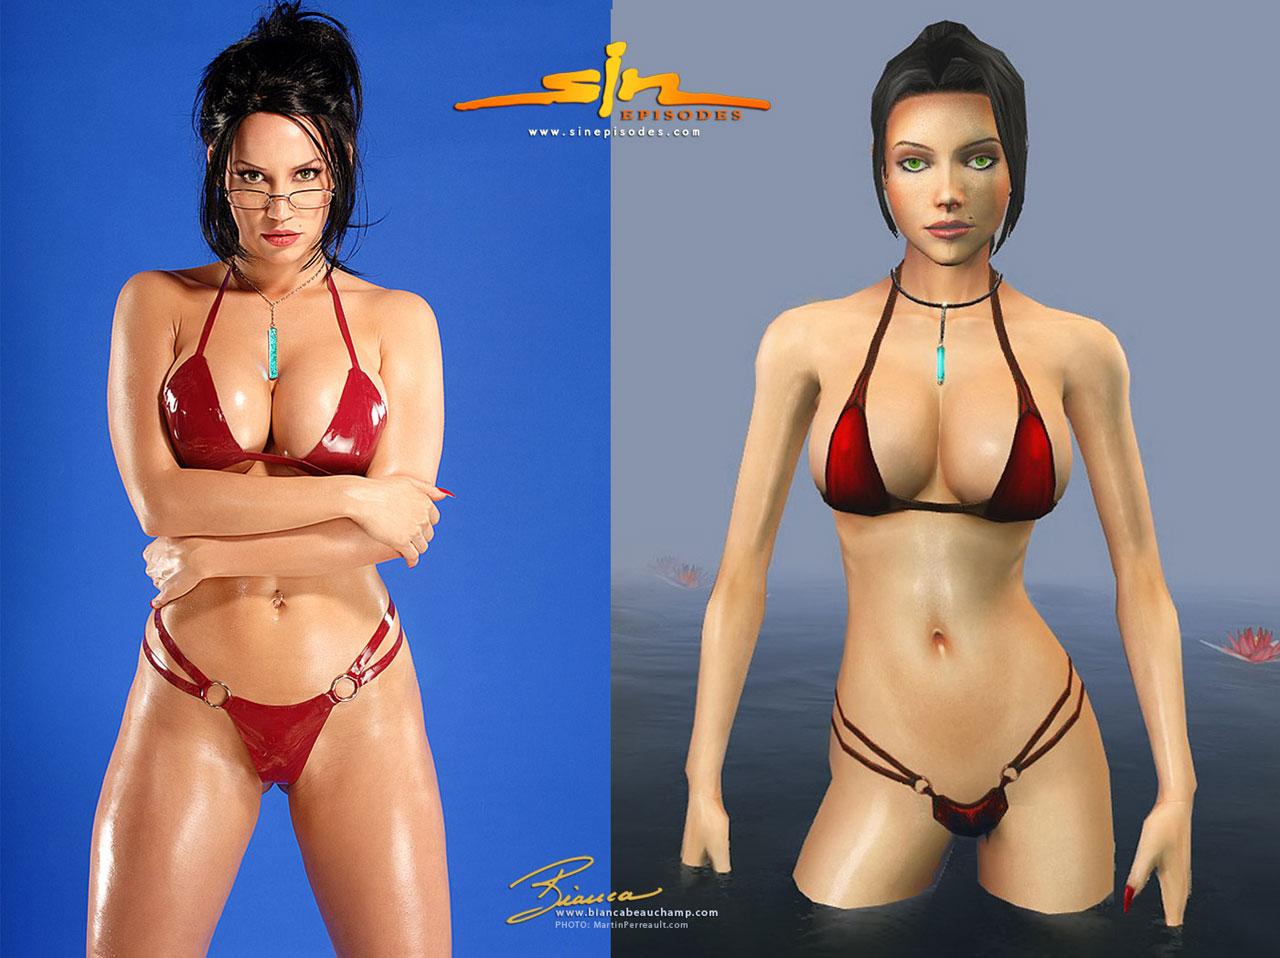 Sin Cosplay Elexis Sinclaire Bikini Starring Bianca Beauchamp by Martin Perreault